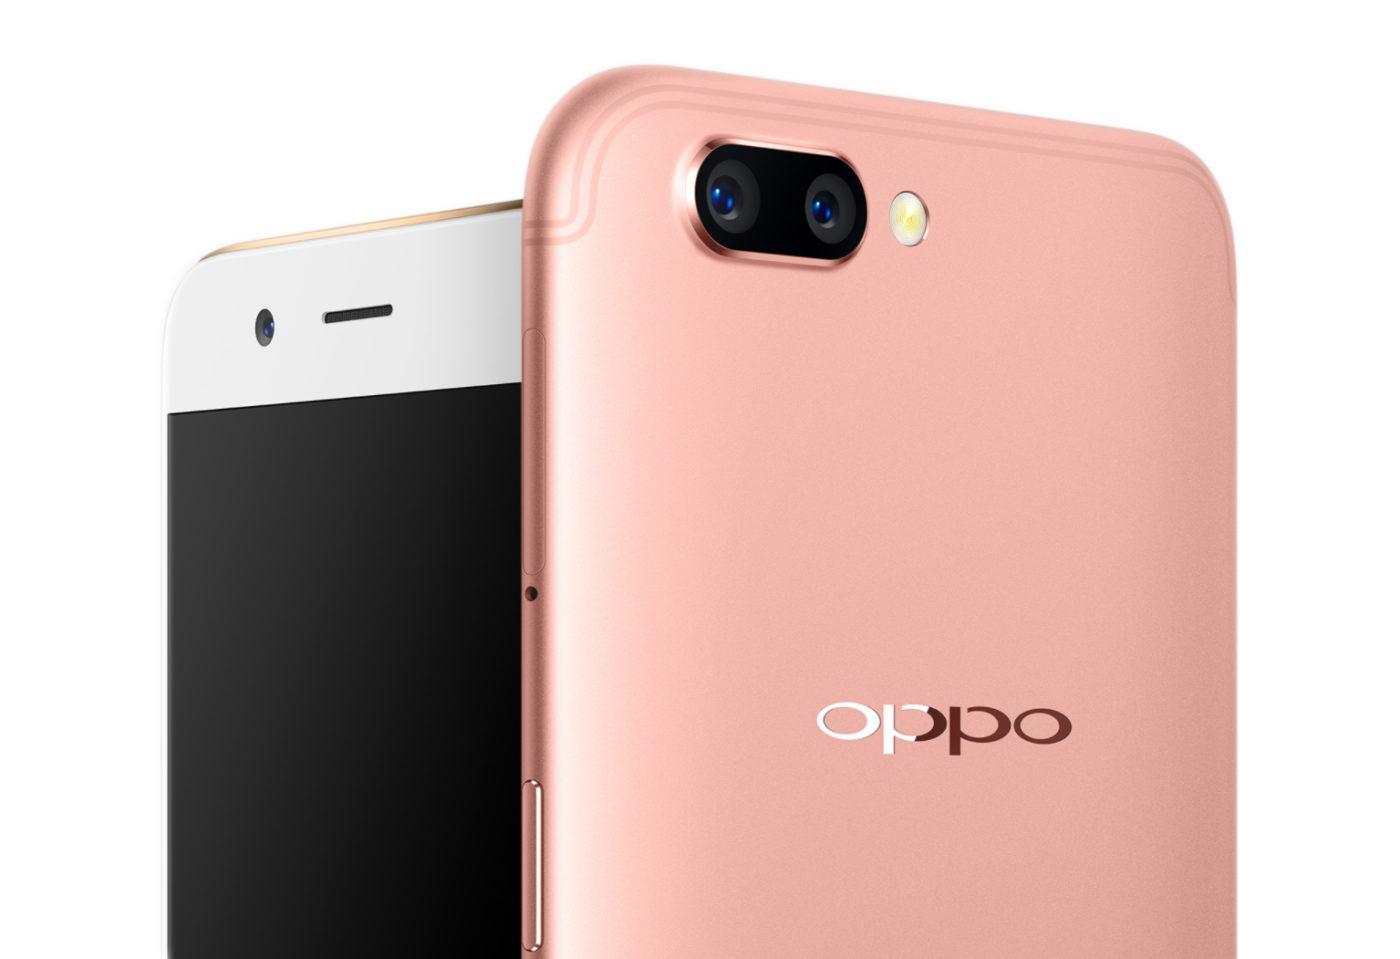 OPPO R11 規格比較彙整 (與 R11 Plus, R9s, iPhone 7 Plus 整理比較) @3C 達人廖阿輝